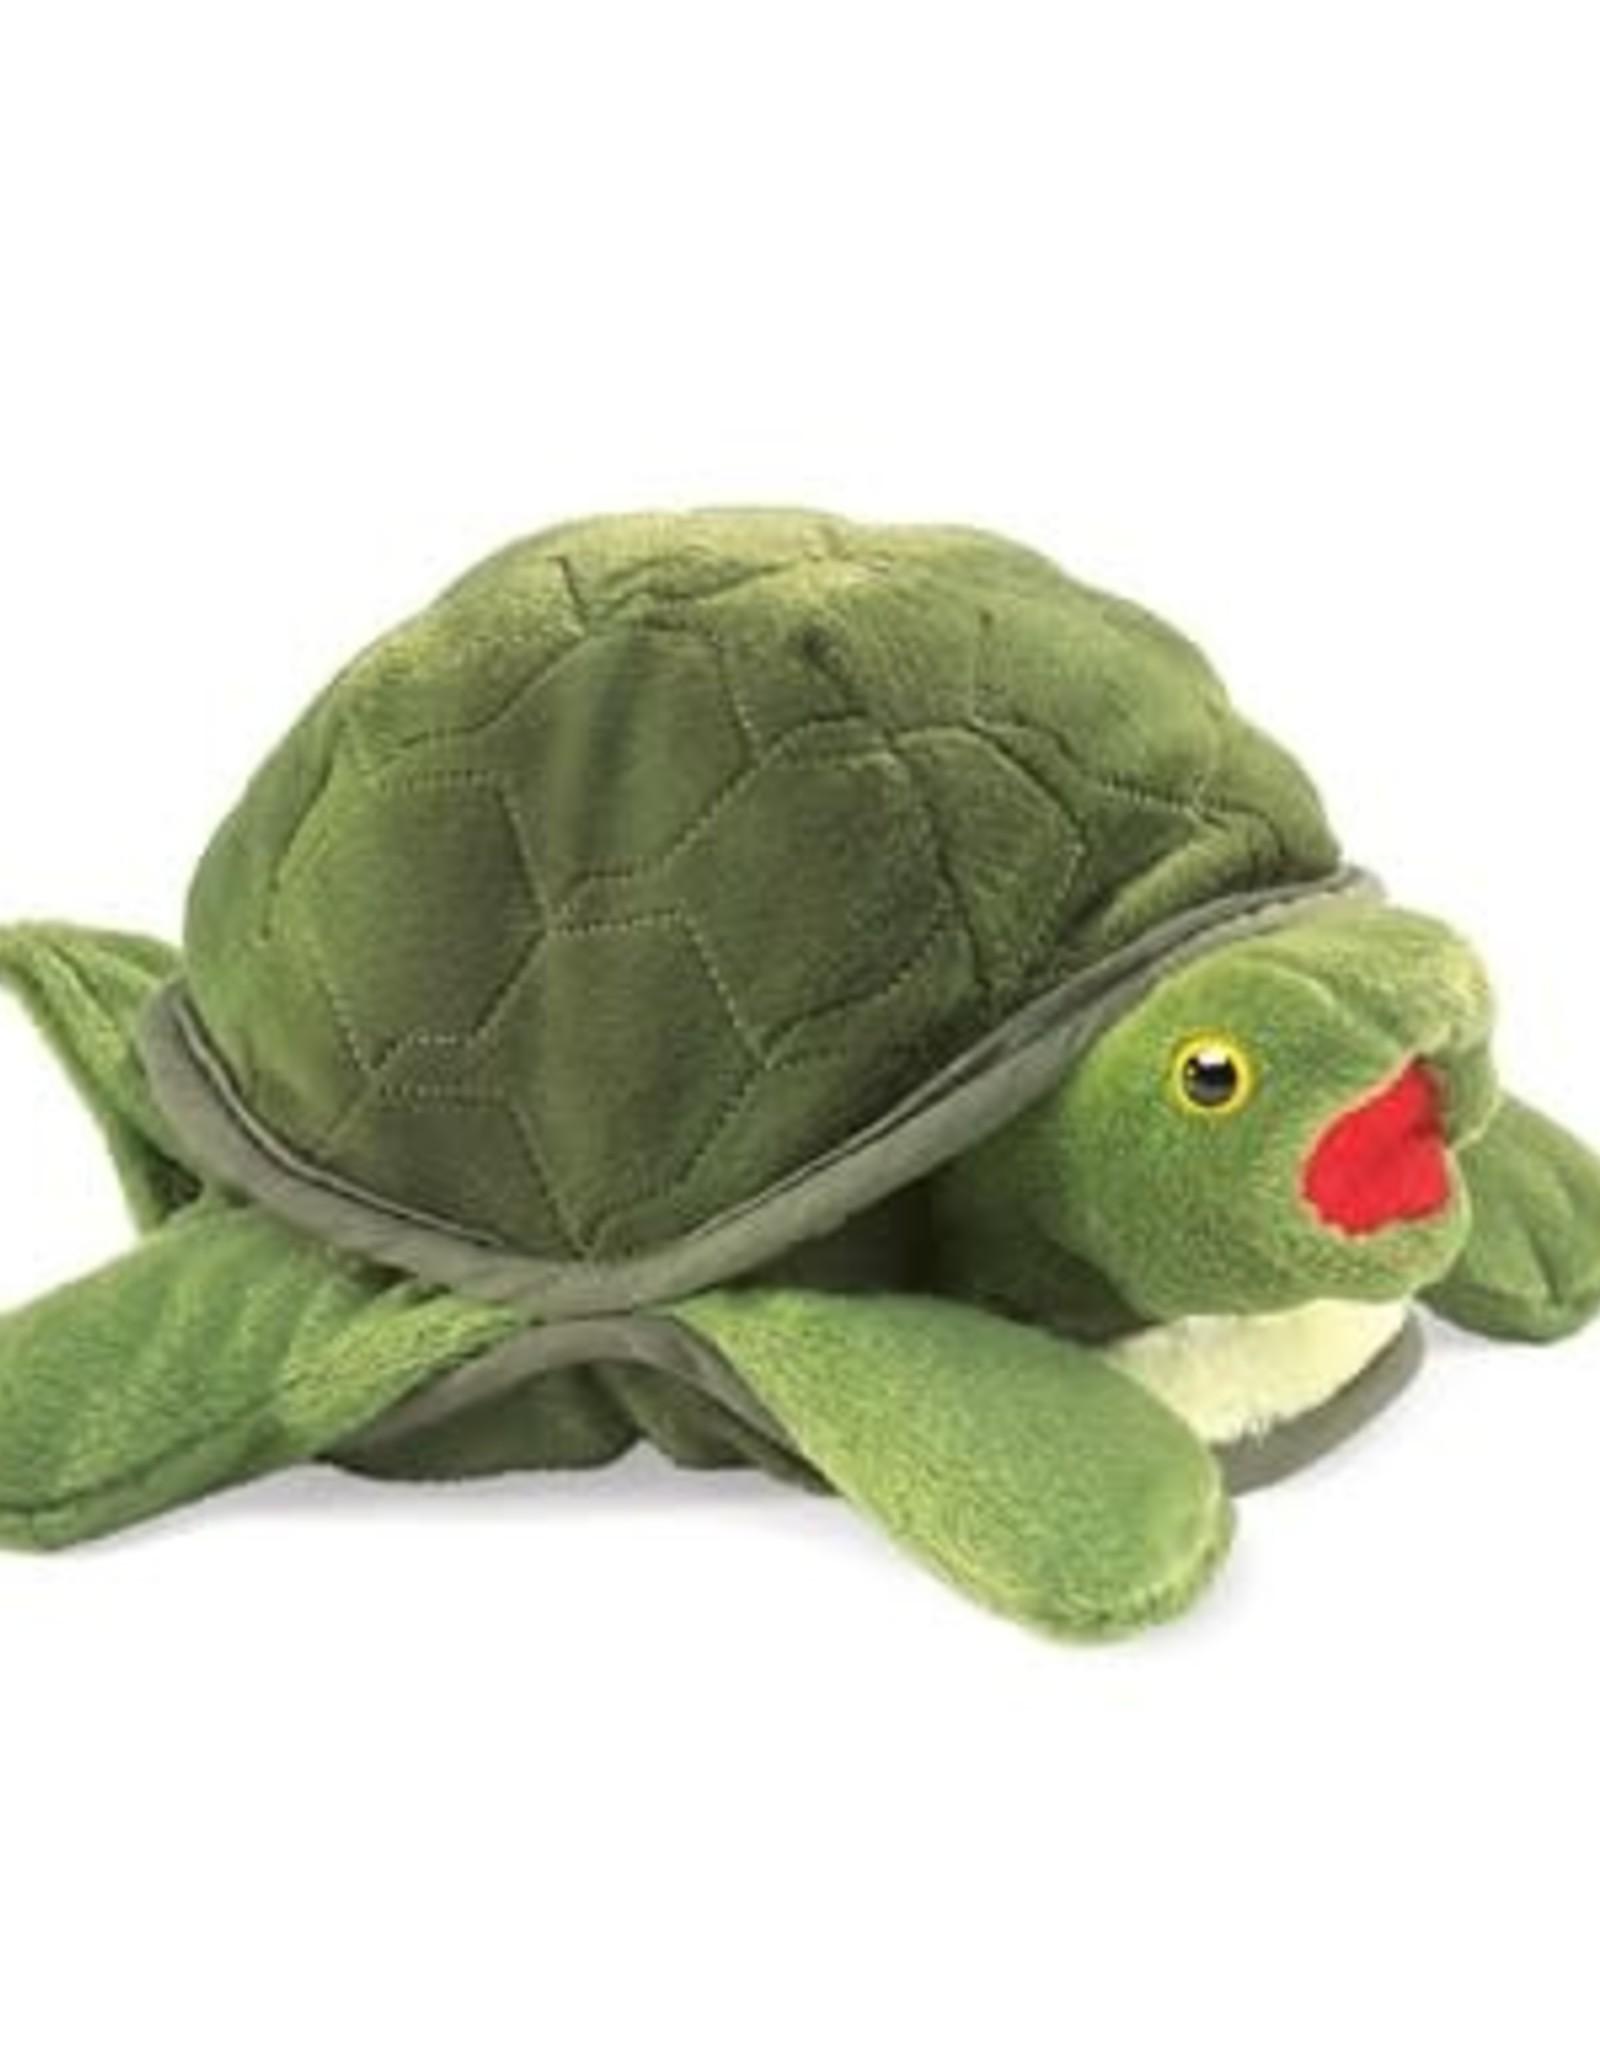 Folkmanis Folkmanis Baby Turtle Puppet